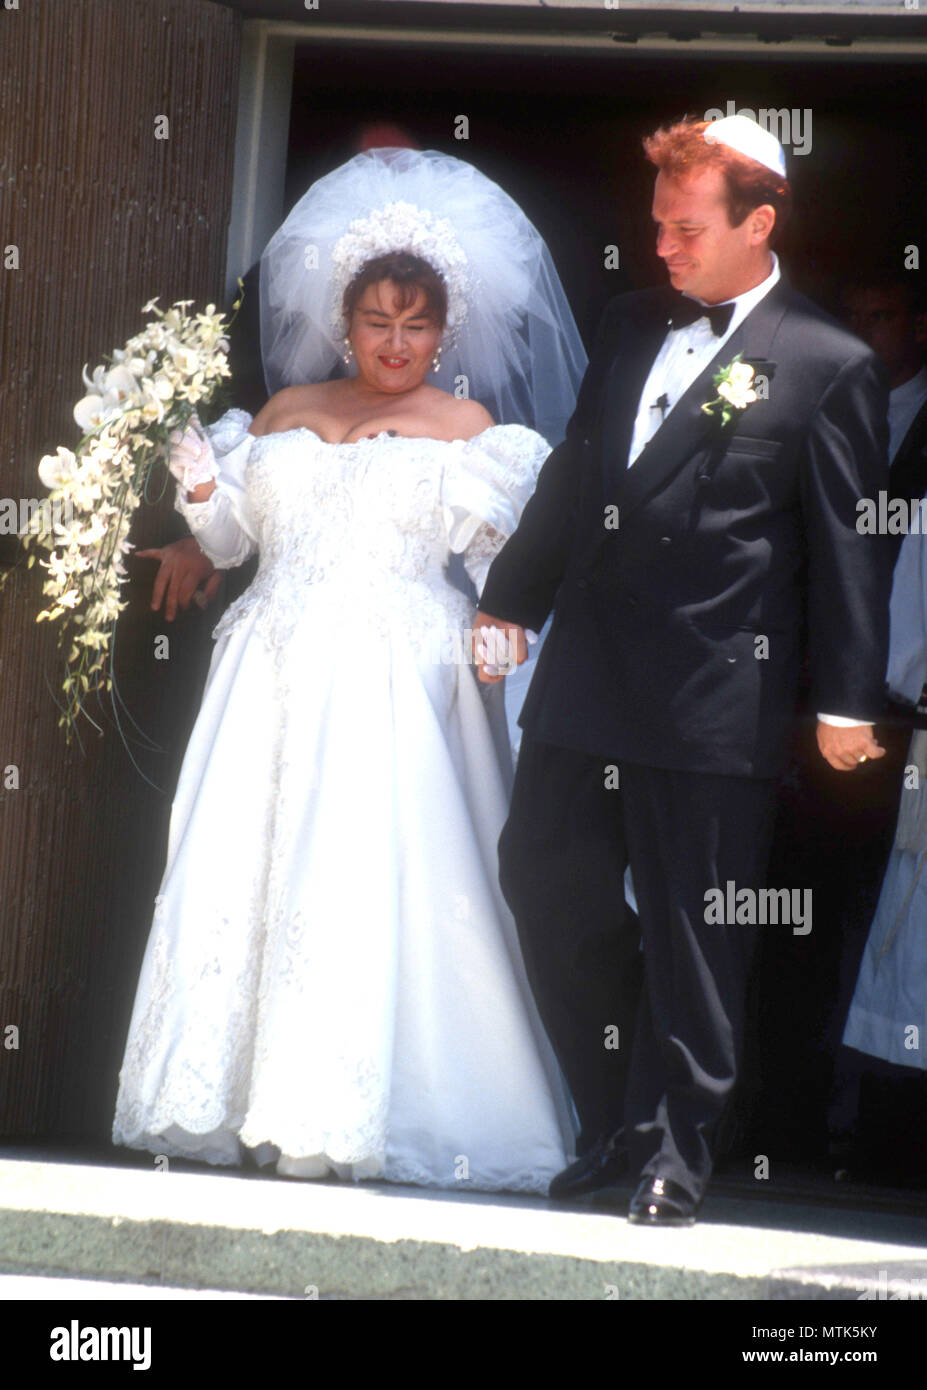 Tom arnold wedding